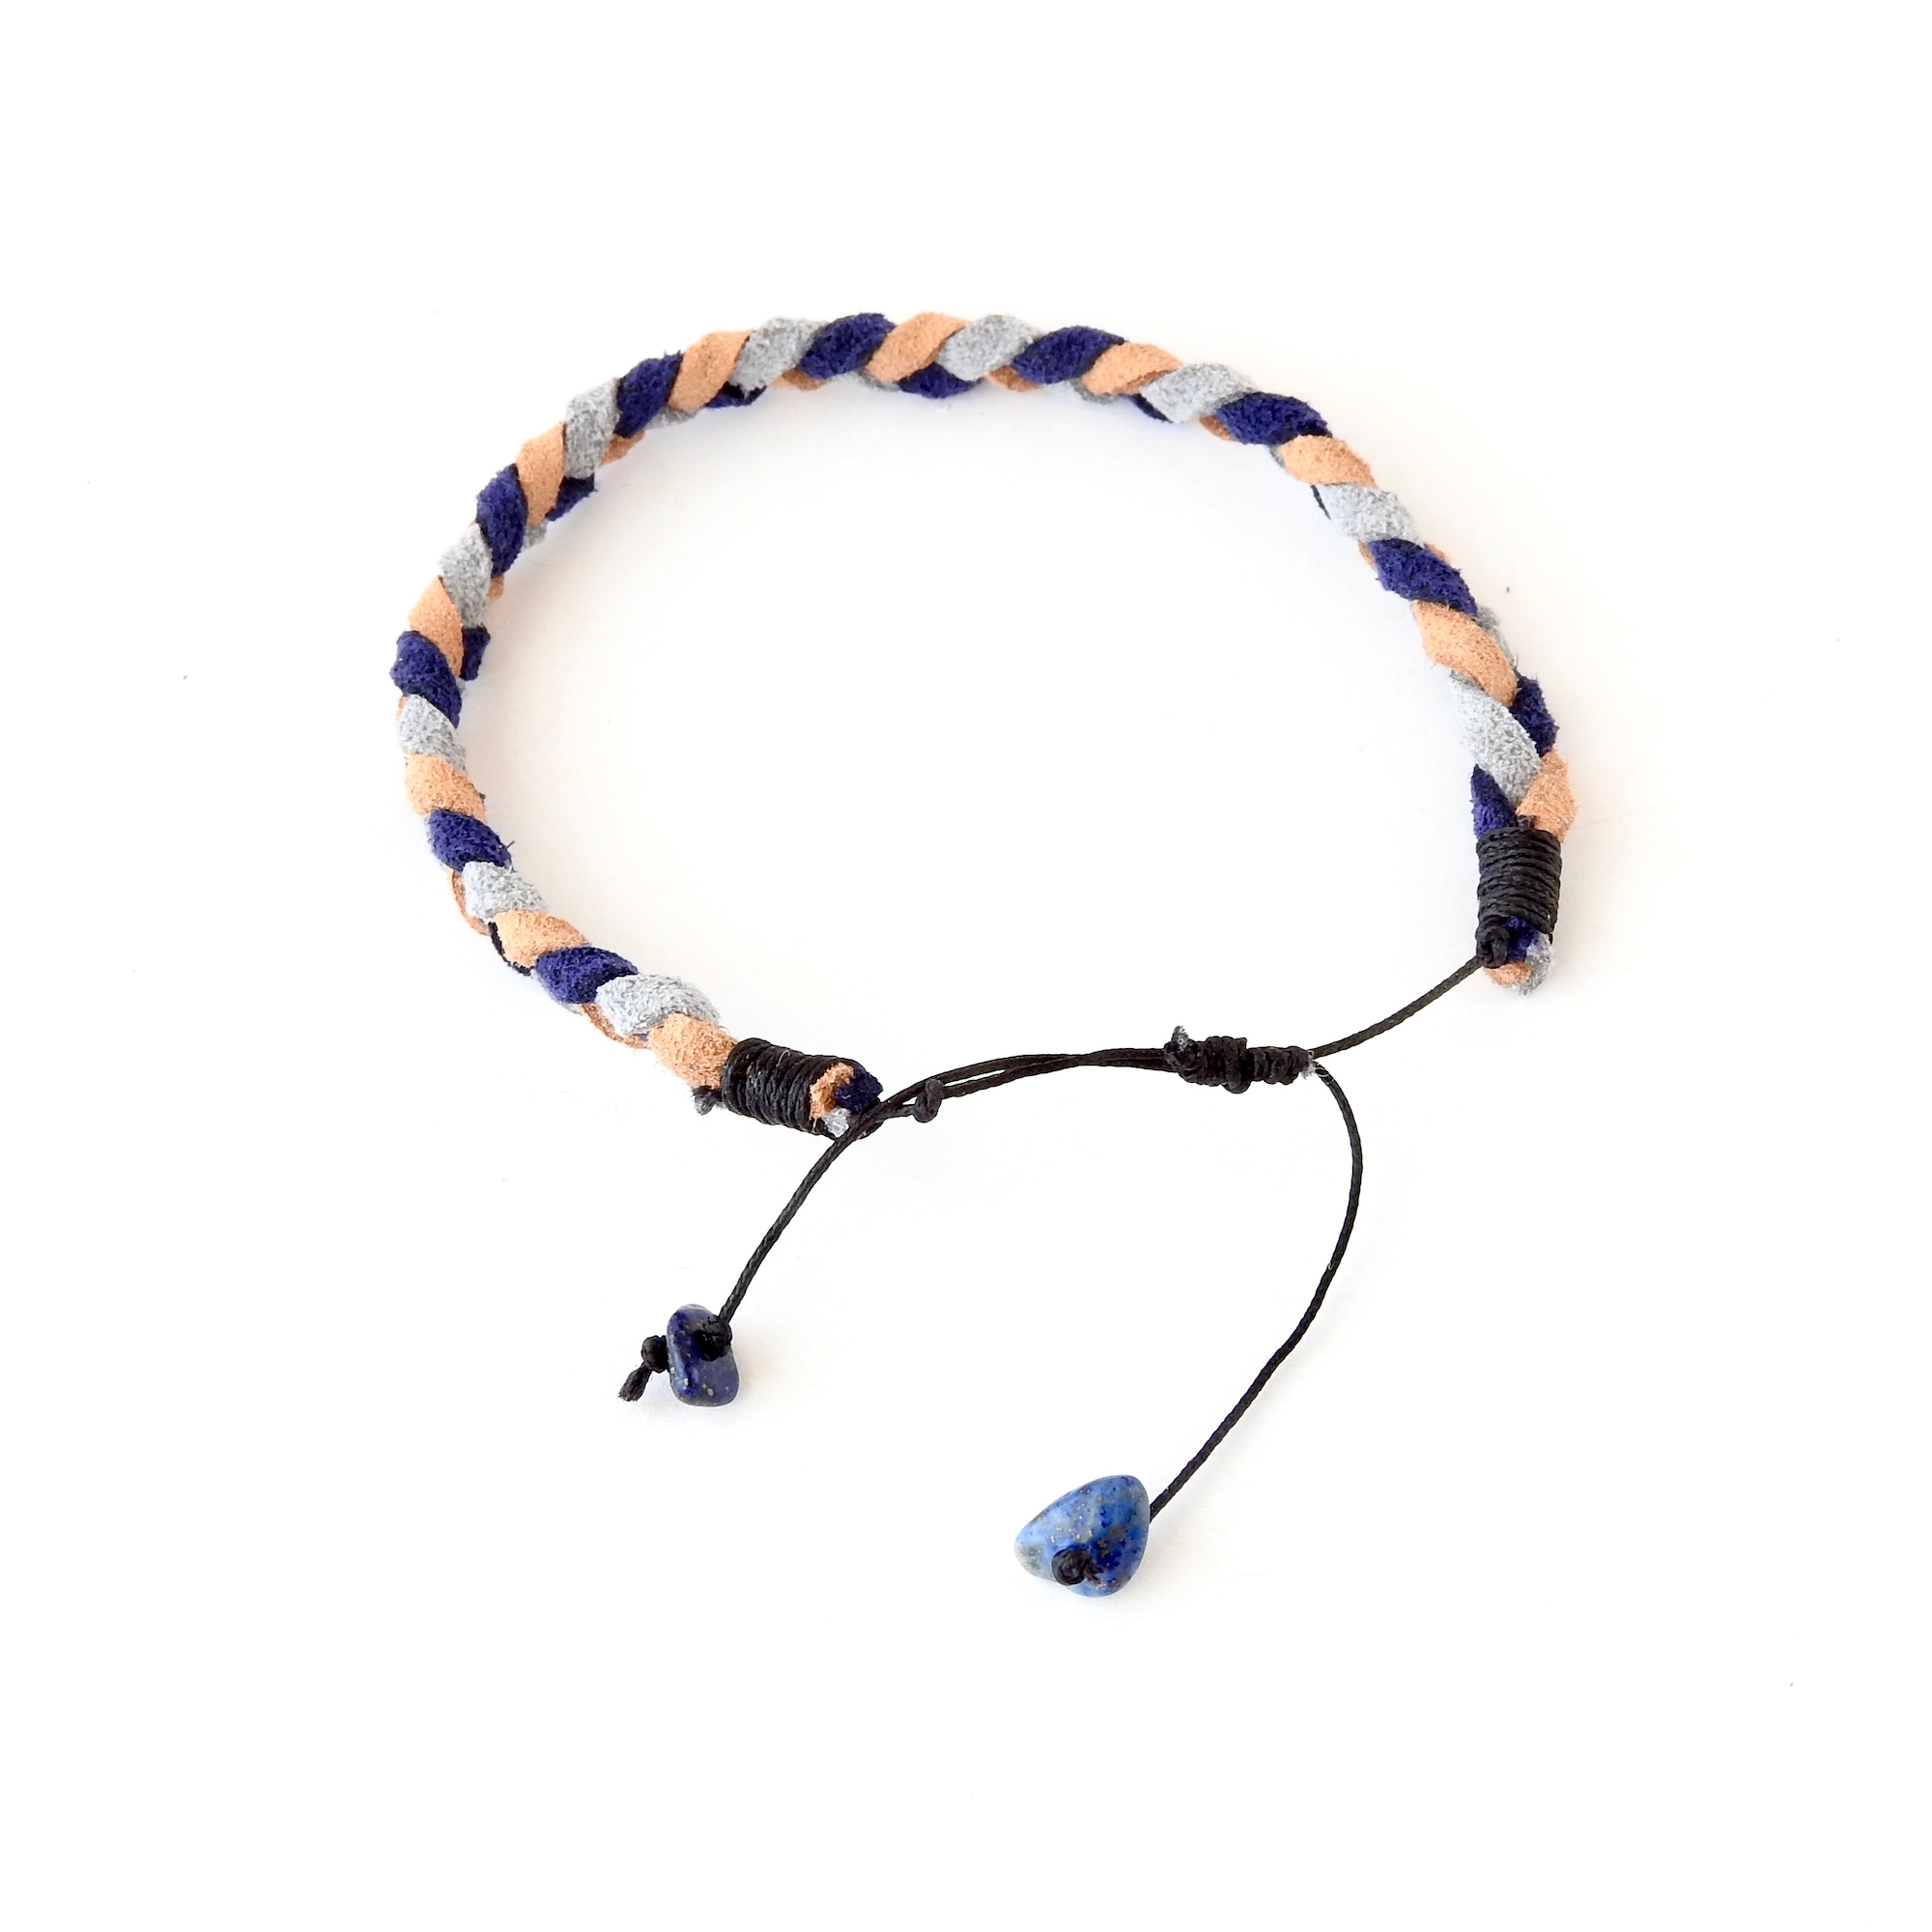 Lapis Lazuli extension cords on adjustable braided suede bracelet for women